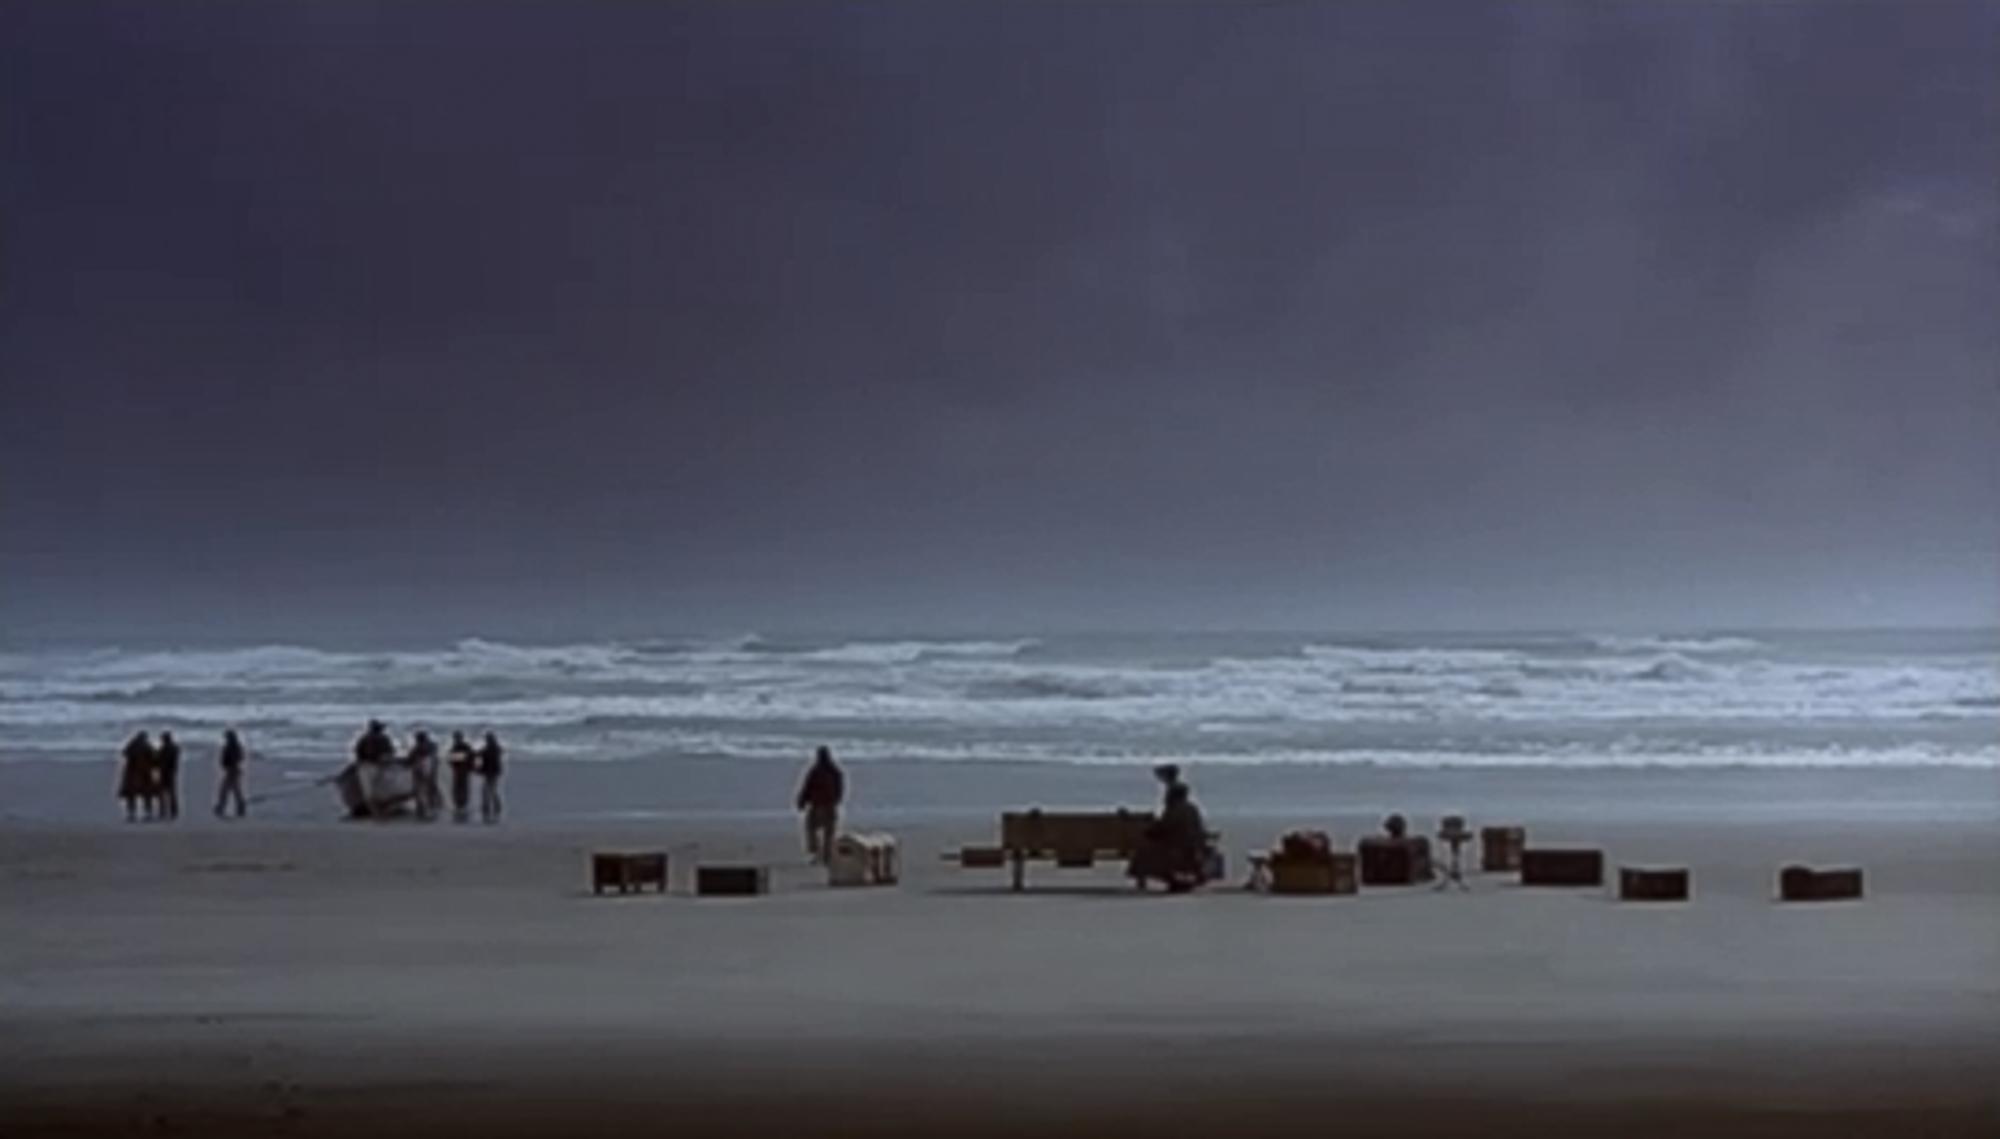 LocalLegends_StuartDryburgh_Placemakingthe-piano-beach-03(resized).jpg